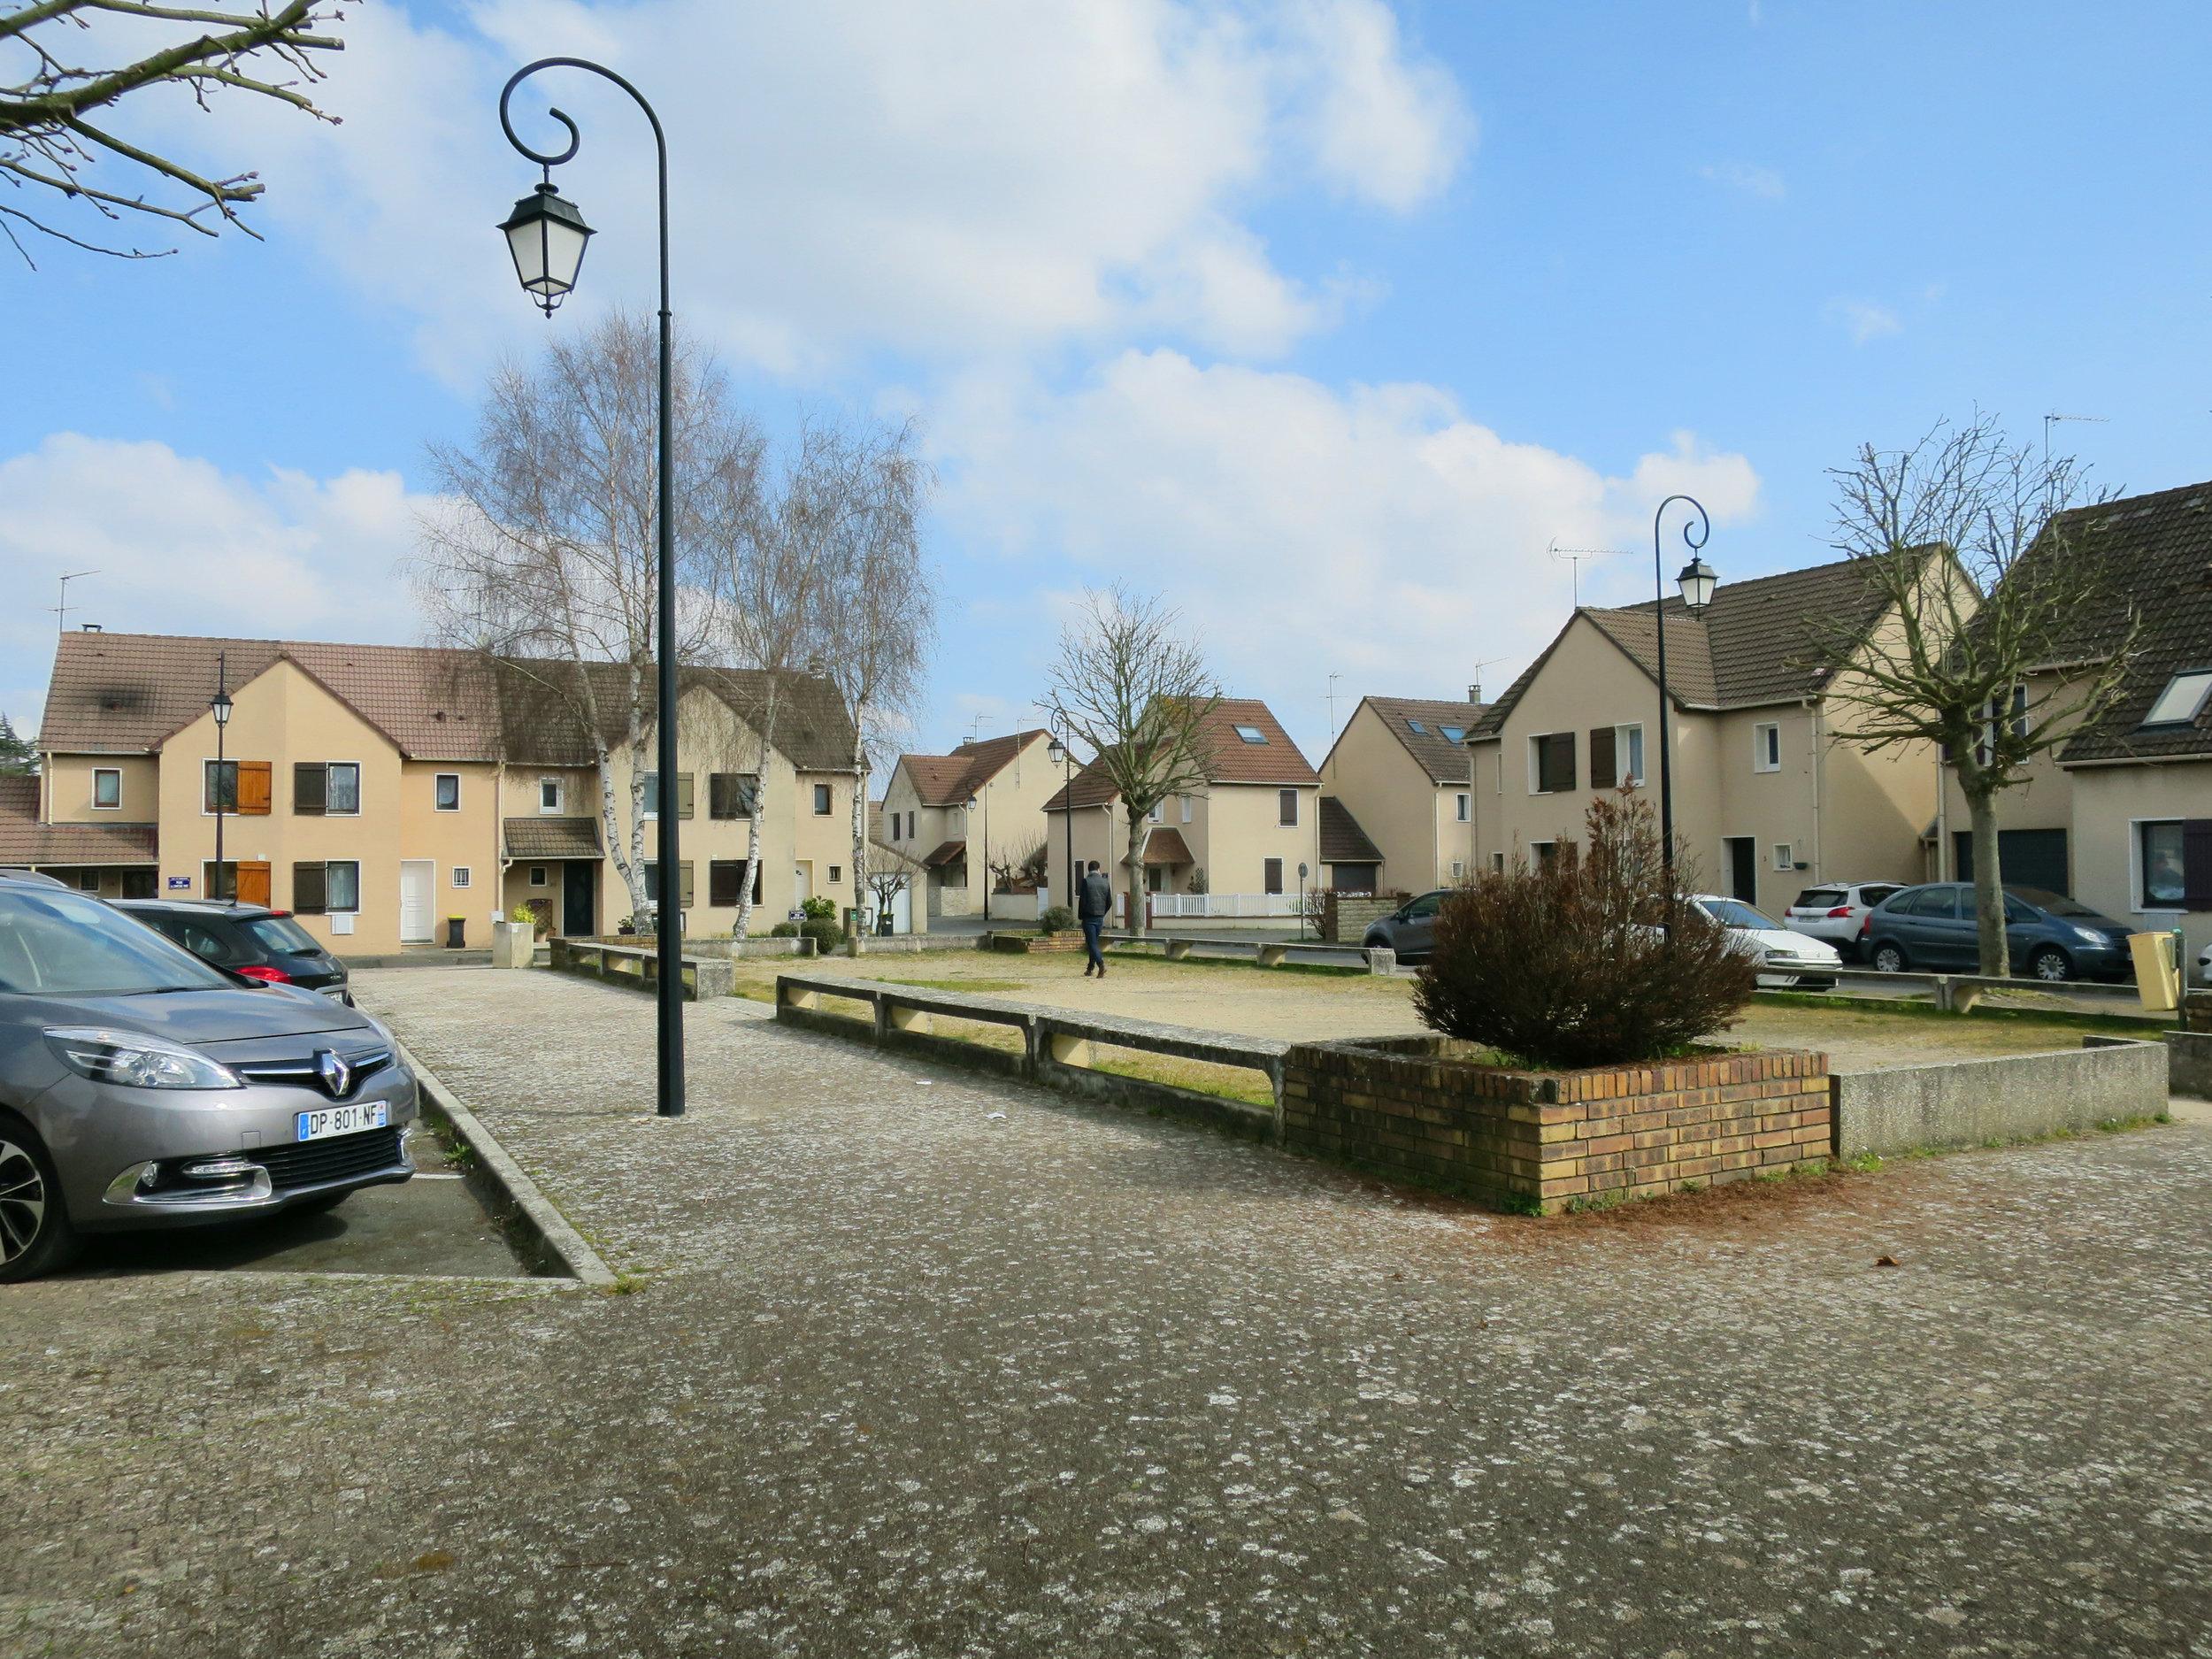 public_square_maurecourt_terraces_gardens_outdoor_landscape_designer_christophe_gautrand_3.jpg